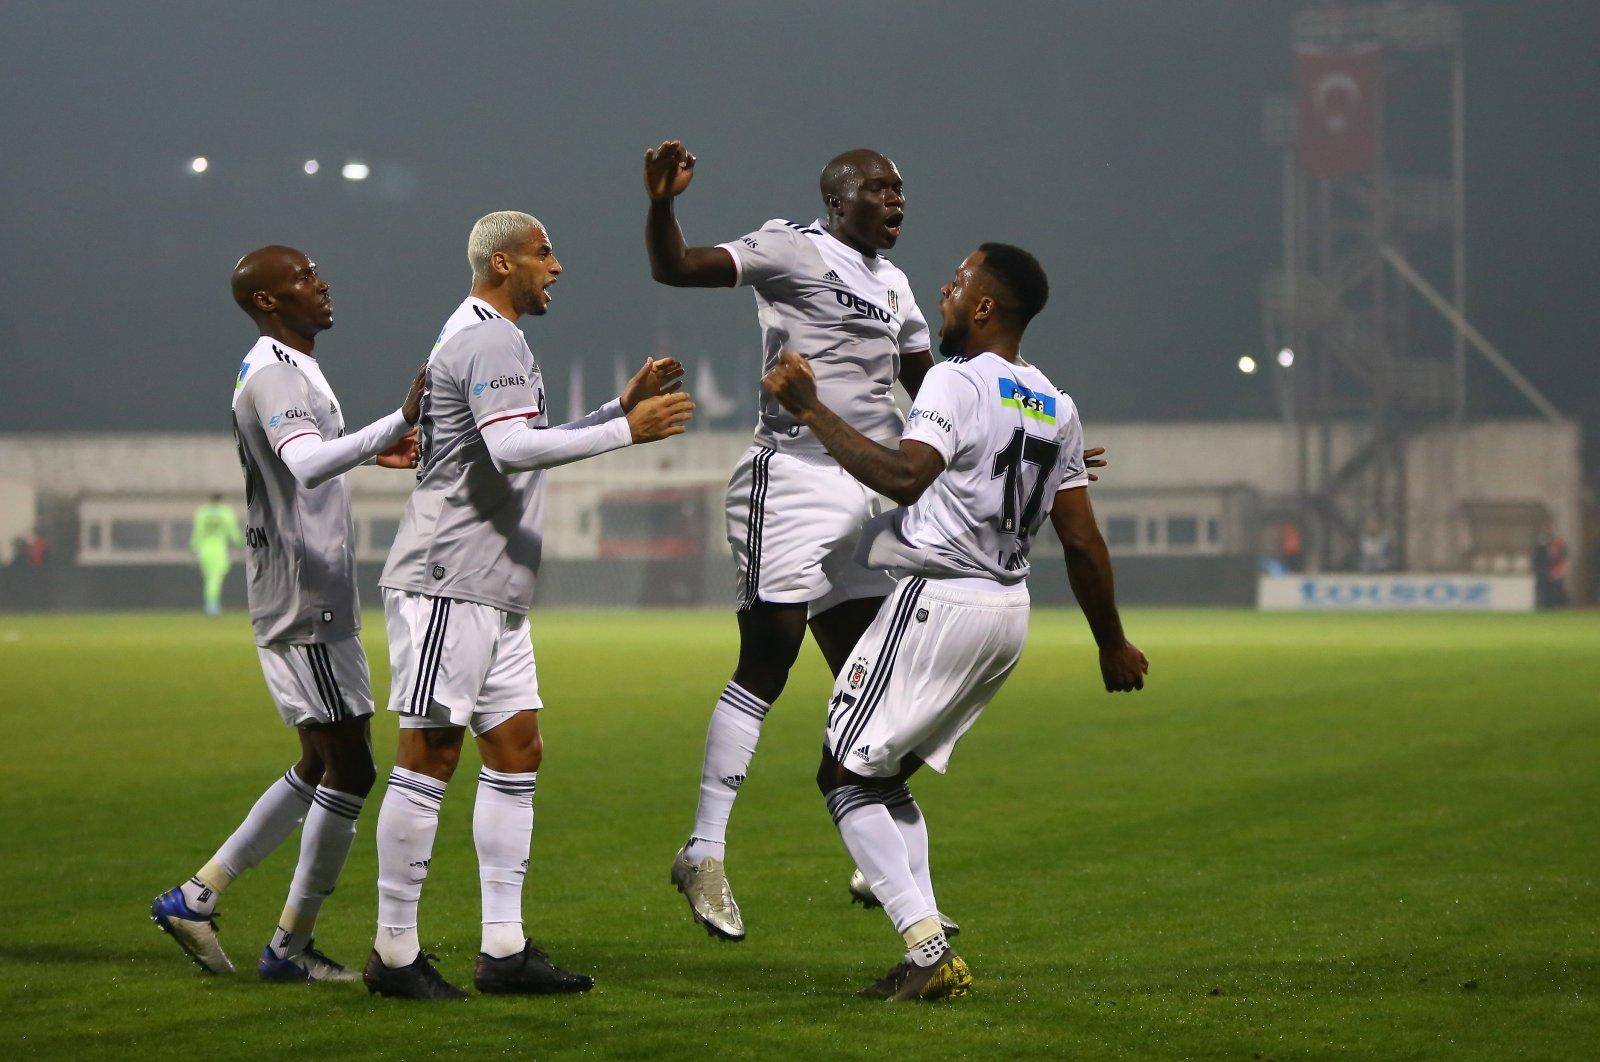 Beşiktaş' Cyle Larin (R) celebrates a goal against Hatayspor in Hatay, southern Turkey, Jan. 10, 2021. (AA Photo)